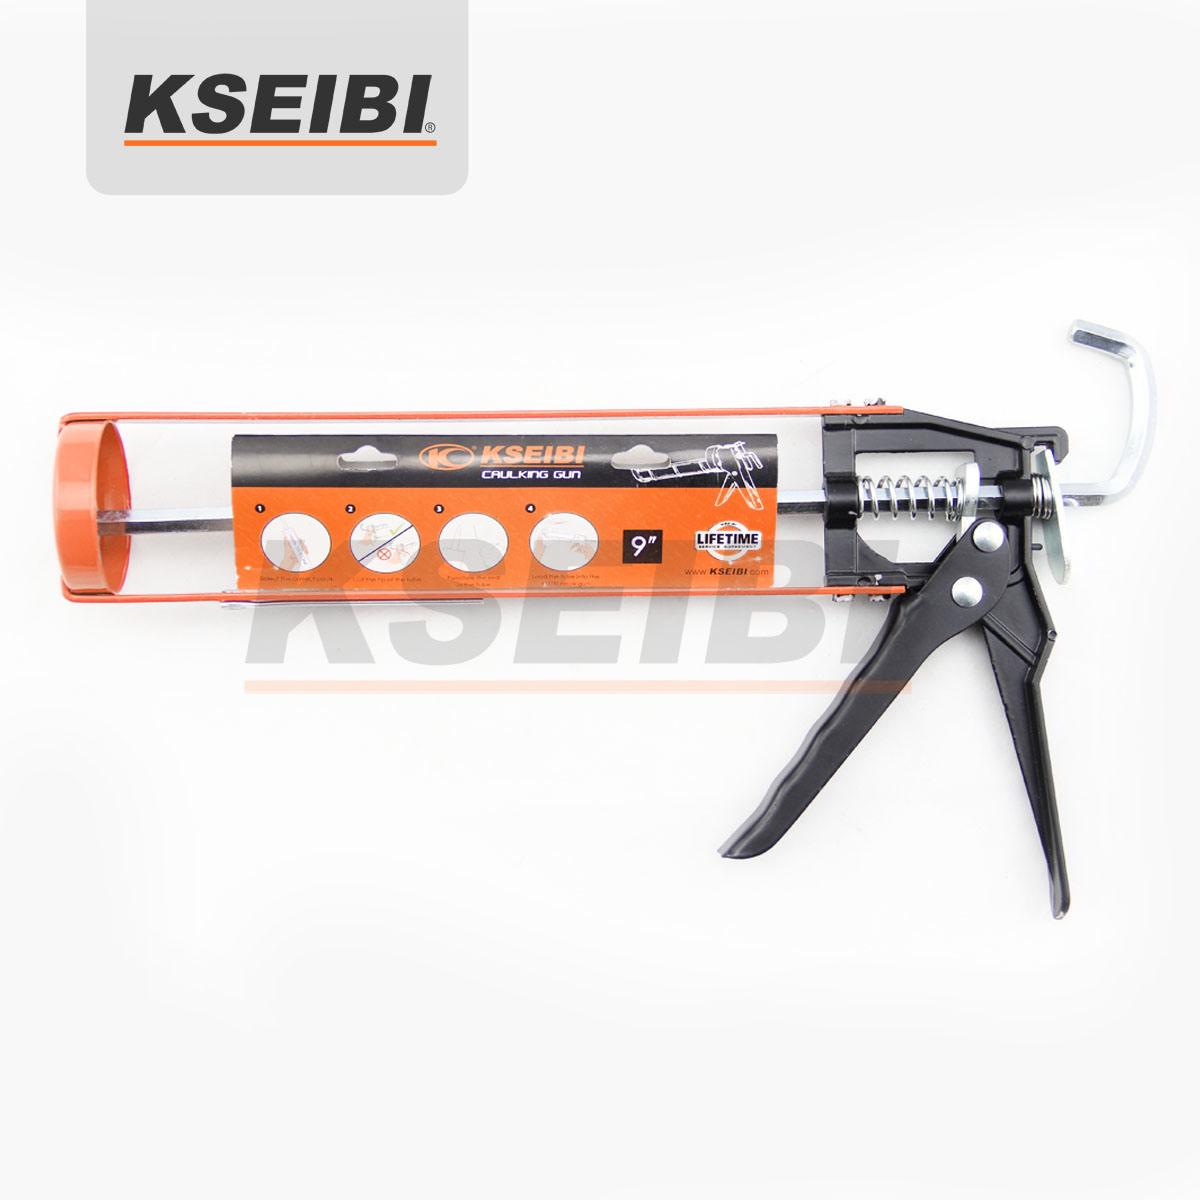 Popular and High Quality Caulking Gun Heavy Duty-Kseibi